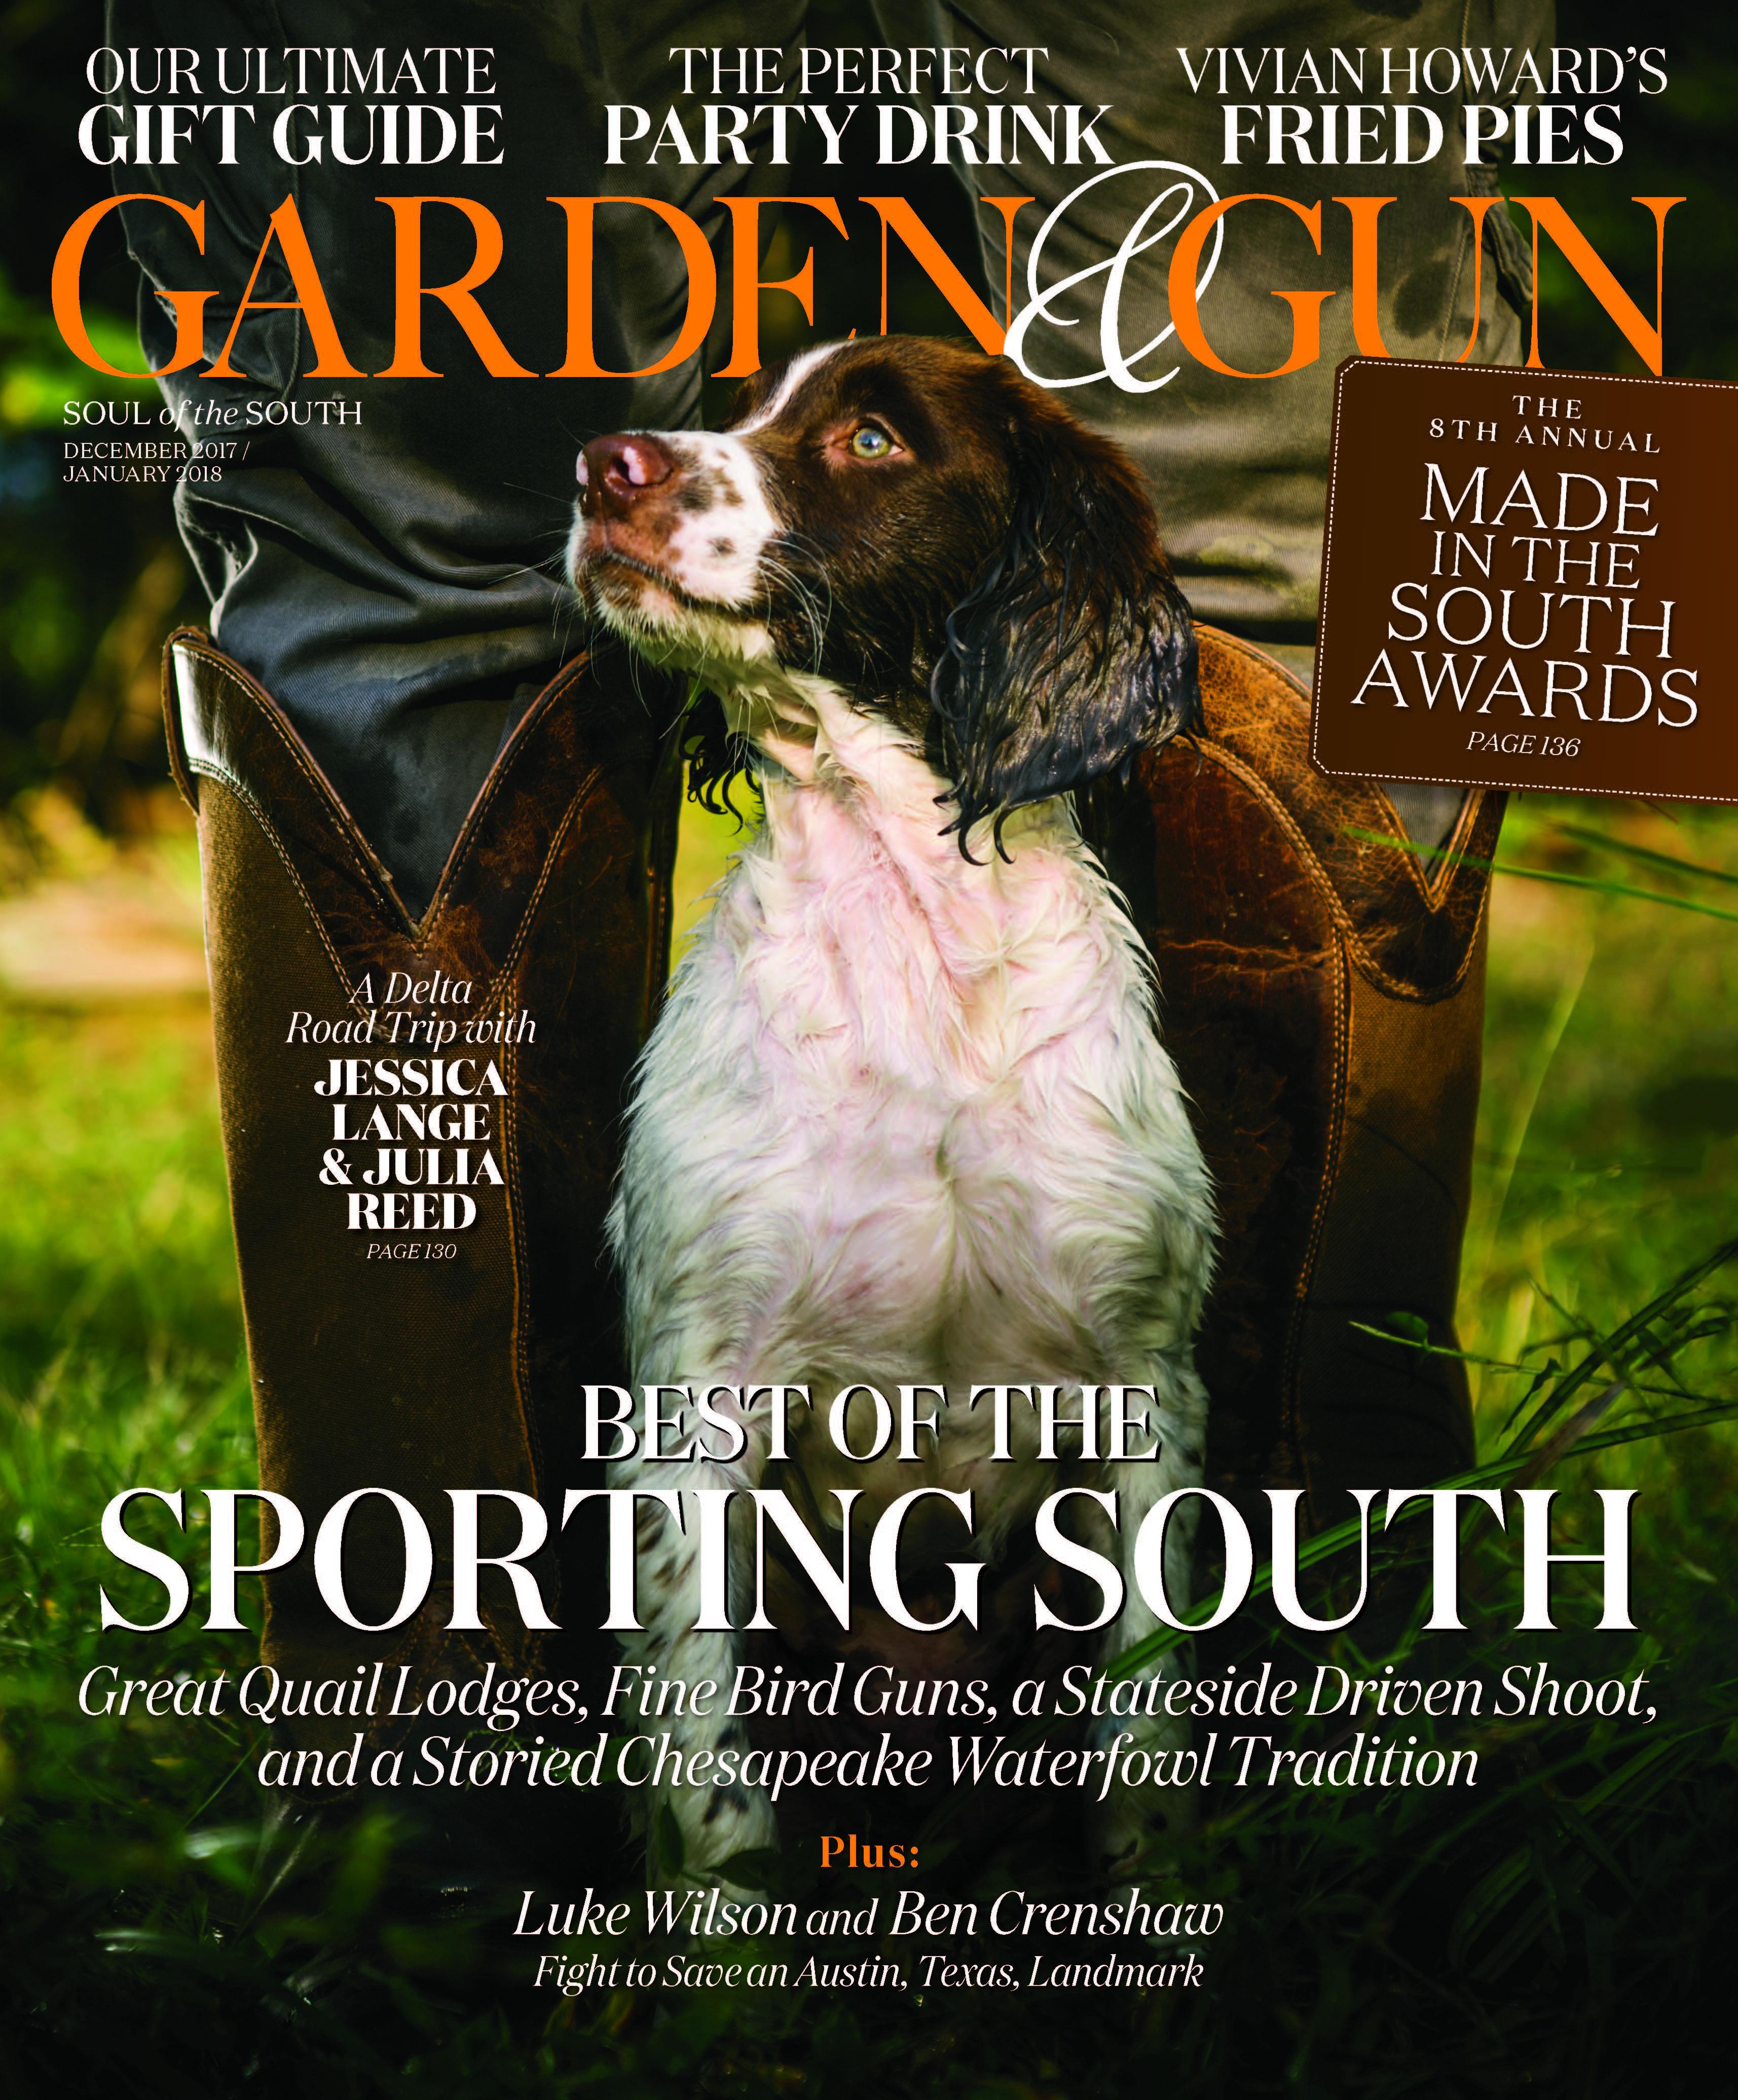 garden and gun magazine. Garden \u0026 Gun Magazine\u0027s Three Secrets Of Success: Continued Commitment To Content Excellence, Refreshing New Design, Always Putting The Reader First \u2013 And Magazine